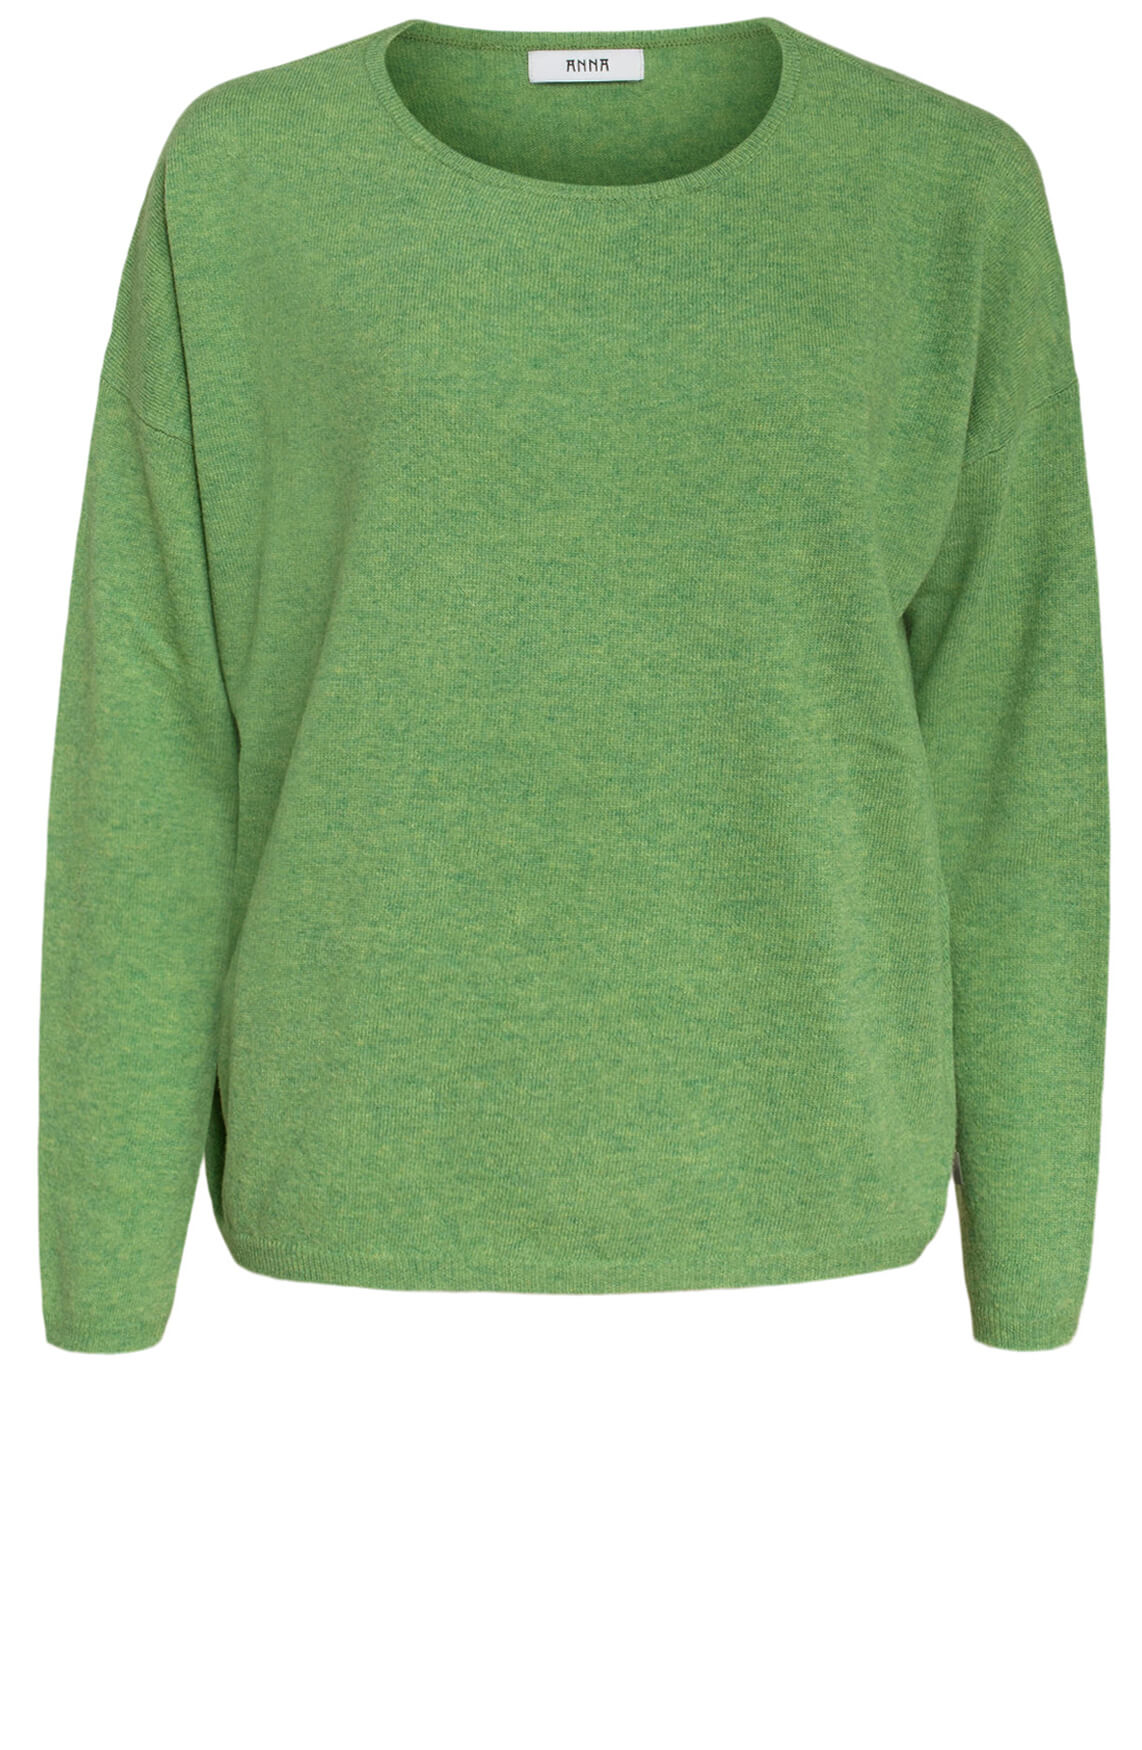 Anna Dames Wollen pullover groen